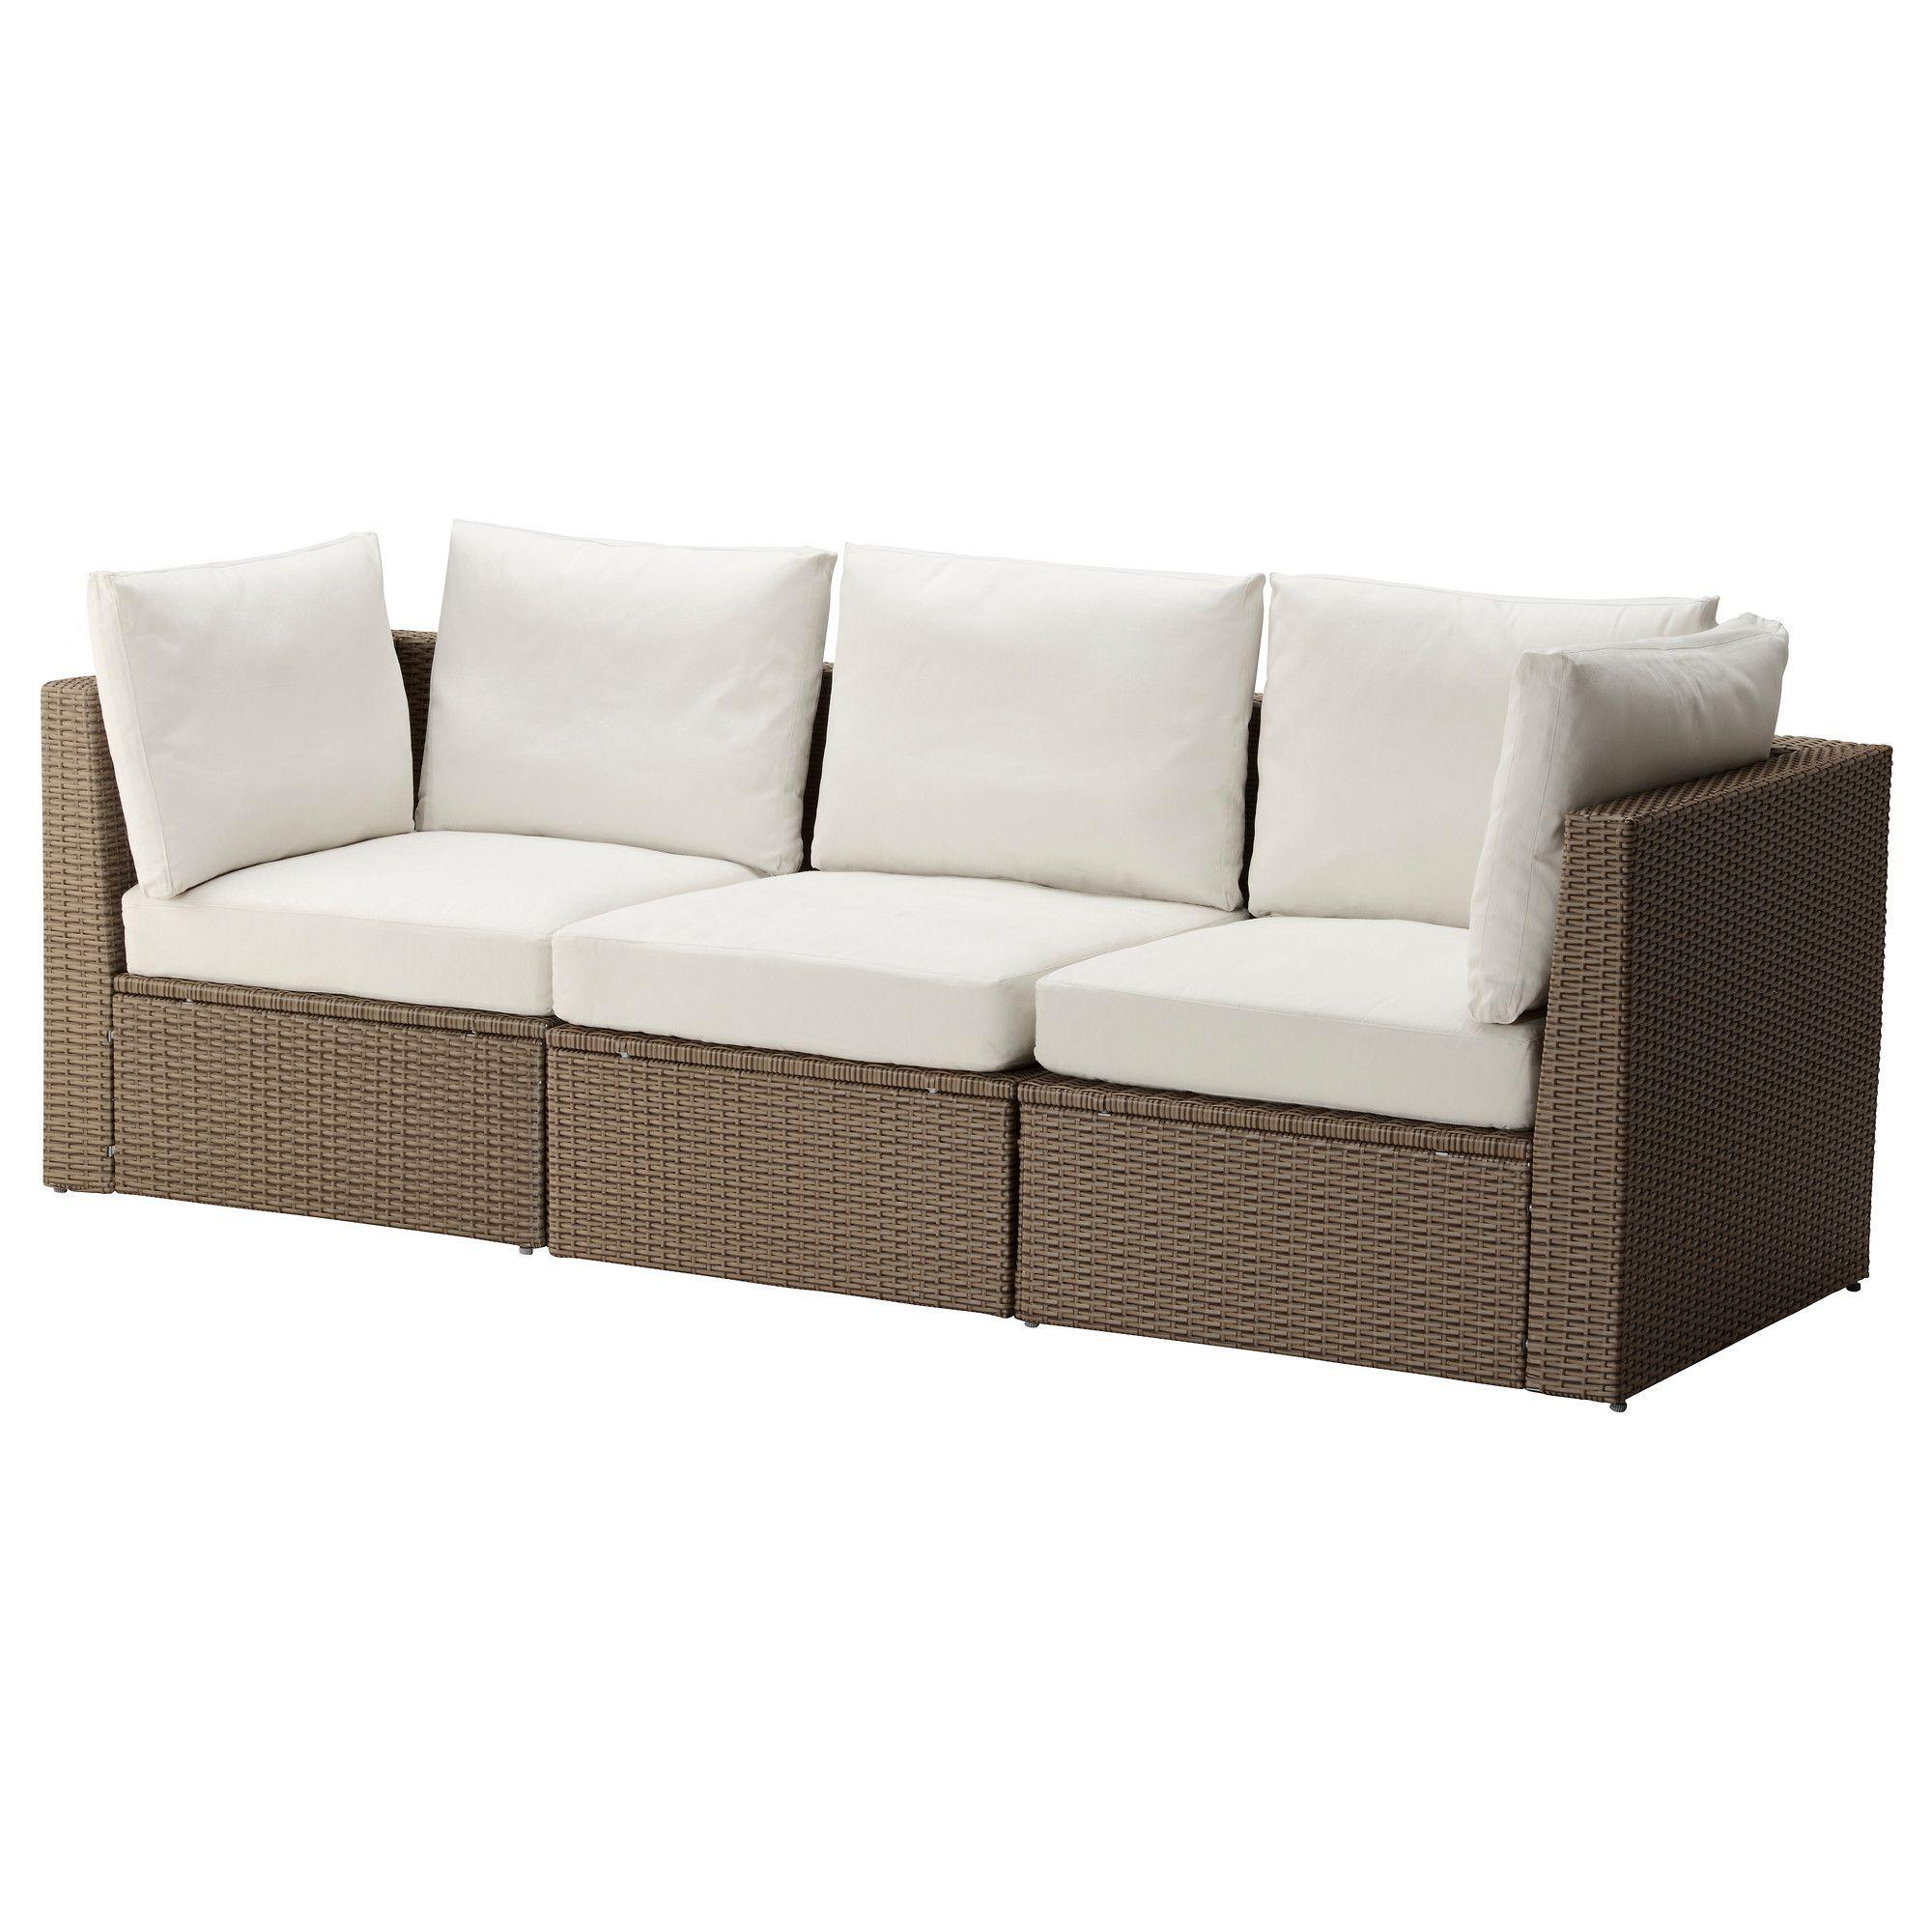 Ikea Us Furniture And Home Furnishings Ikea Outdoor Patio Furniture Pillows Ikea Patio